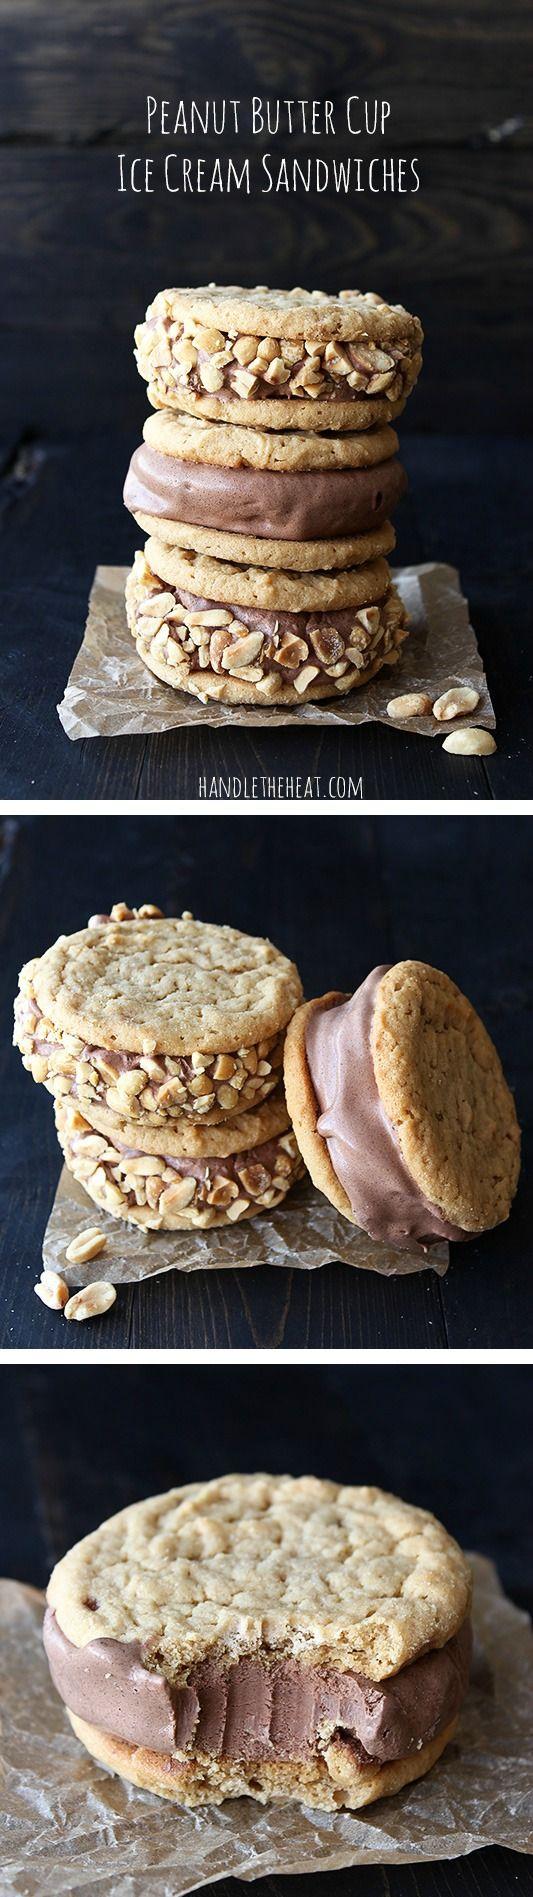 Peanut Butter Cup Ice Cream Sandwiches